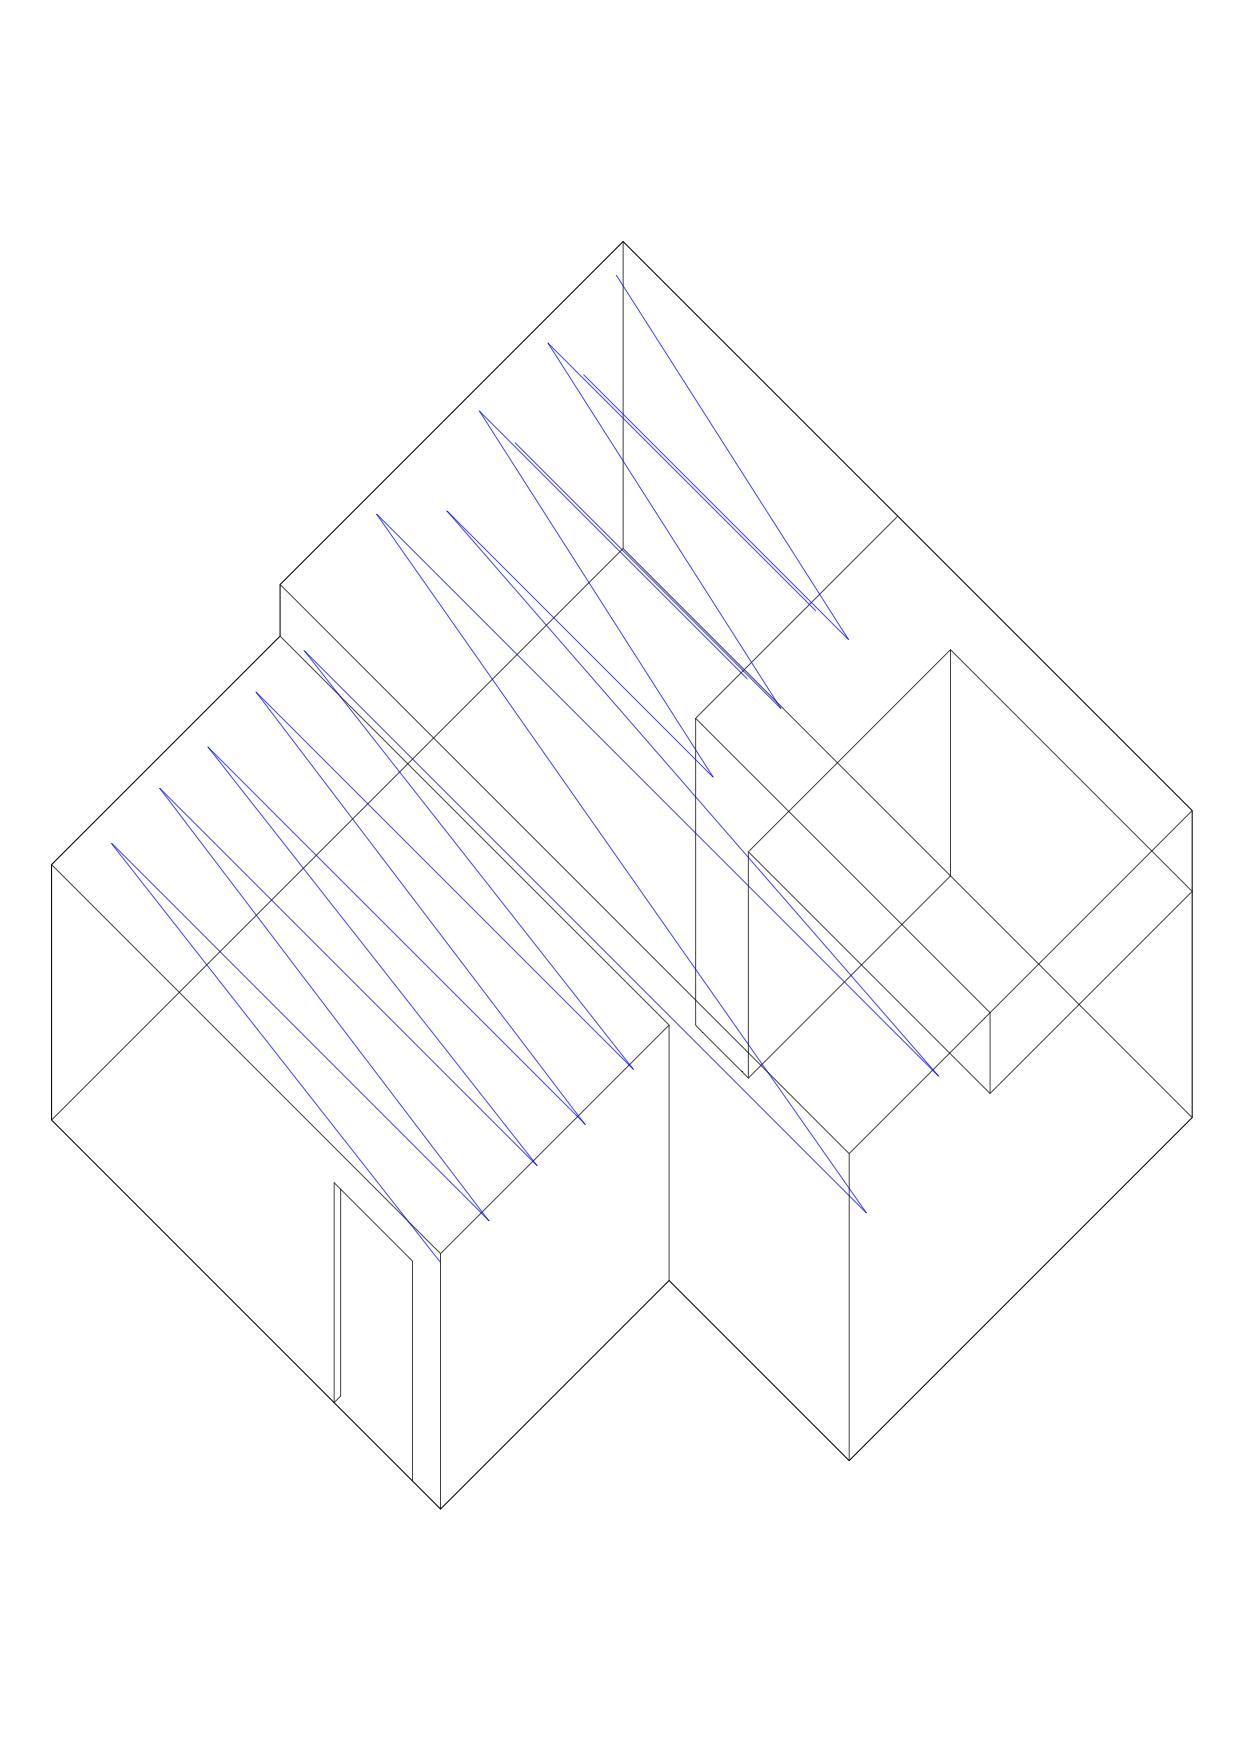 BNKR_Architektur_001